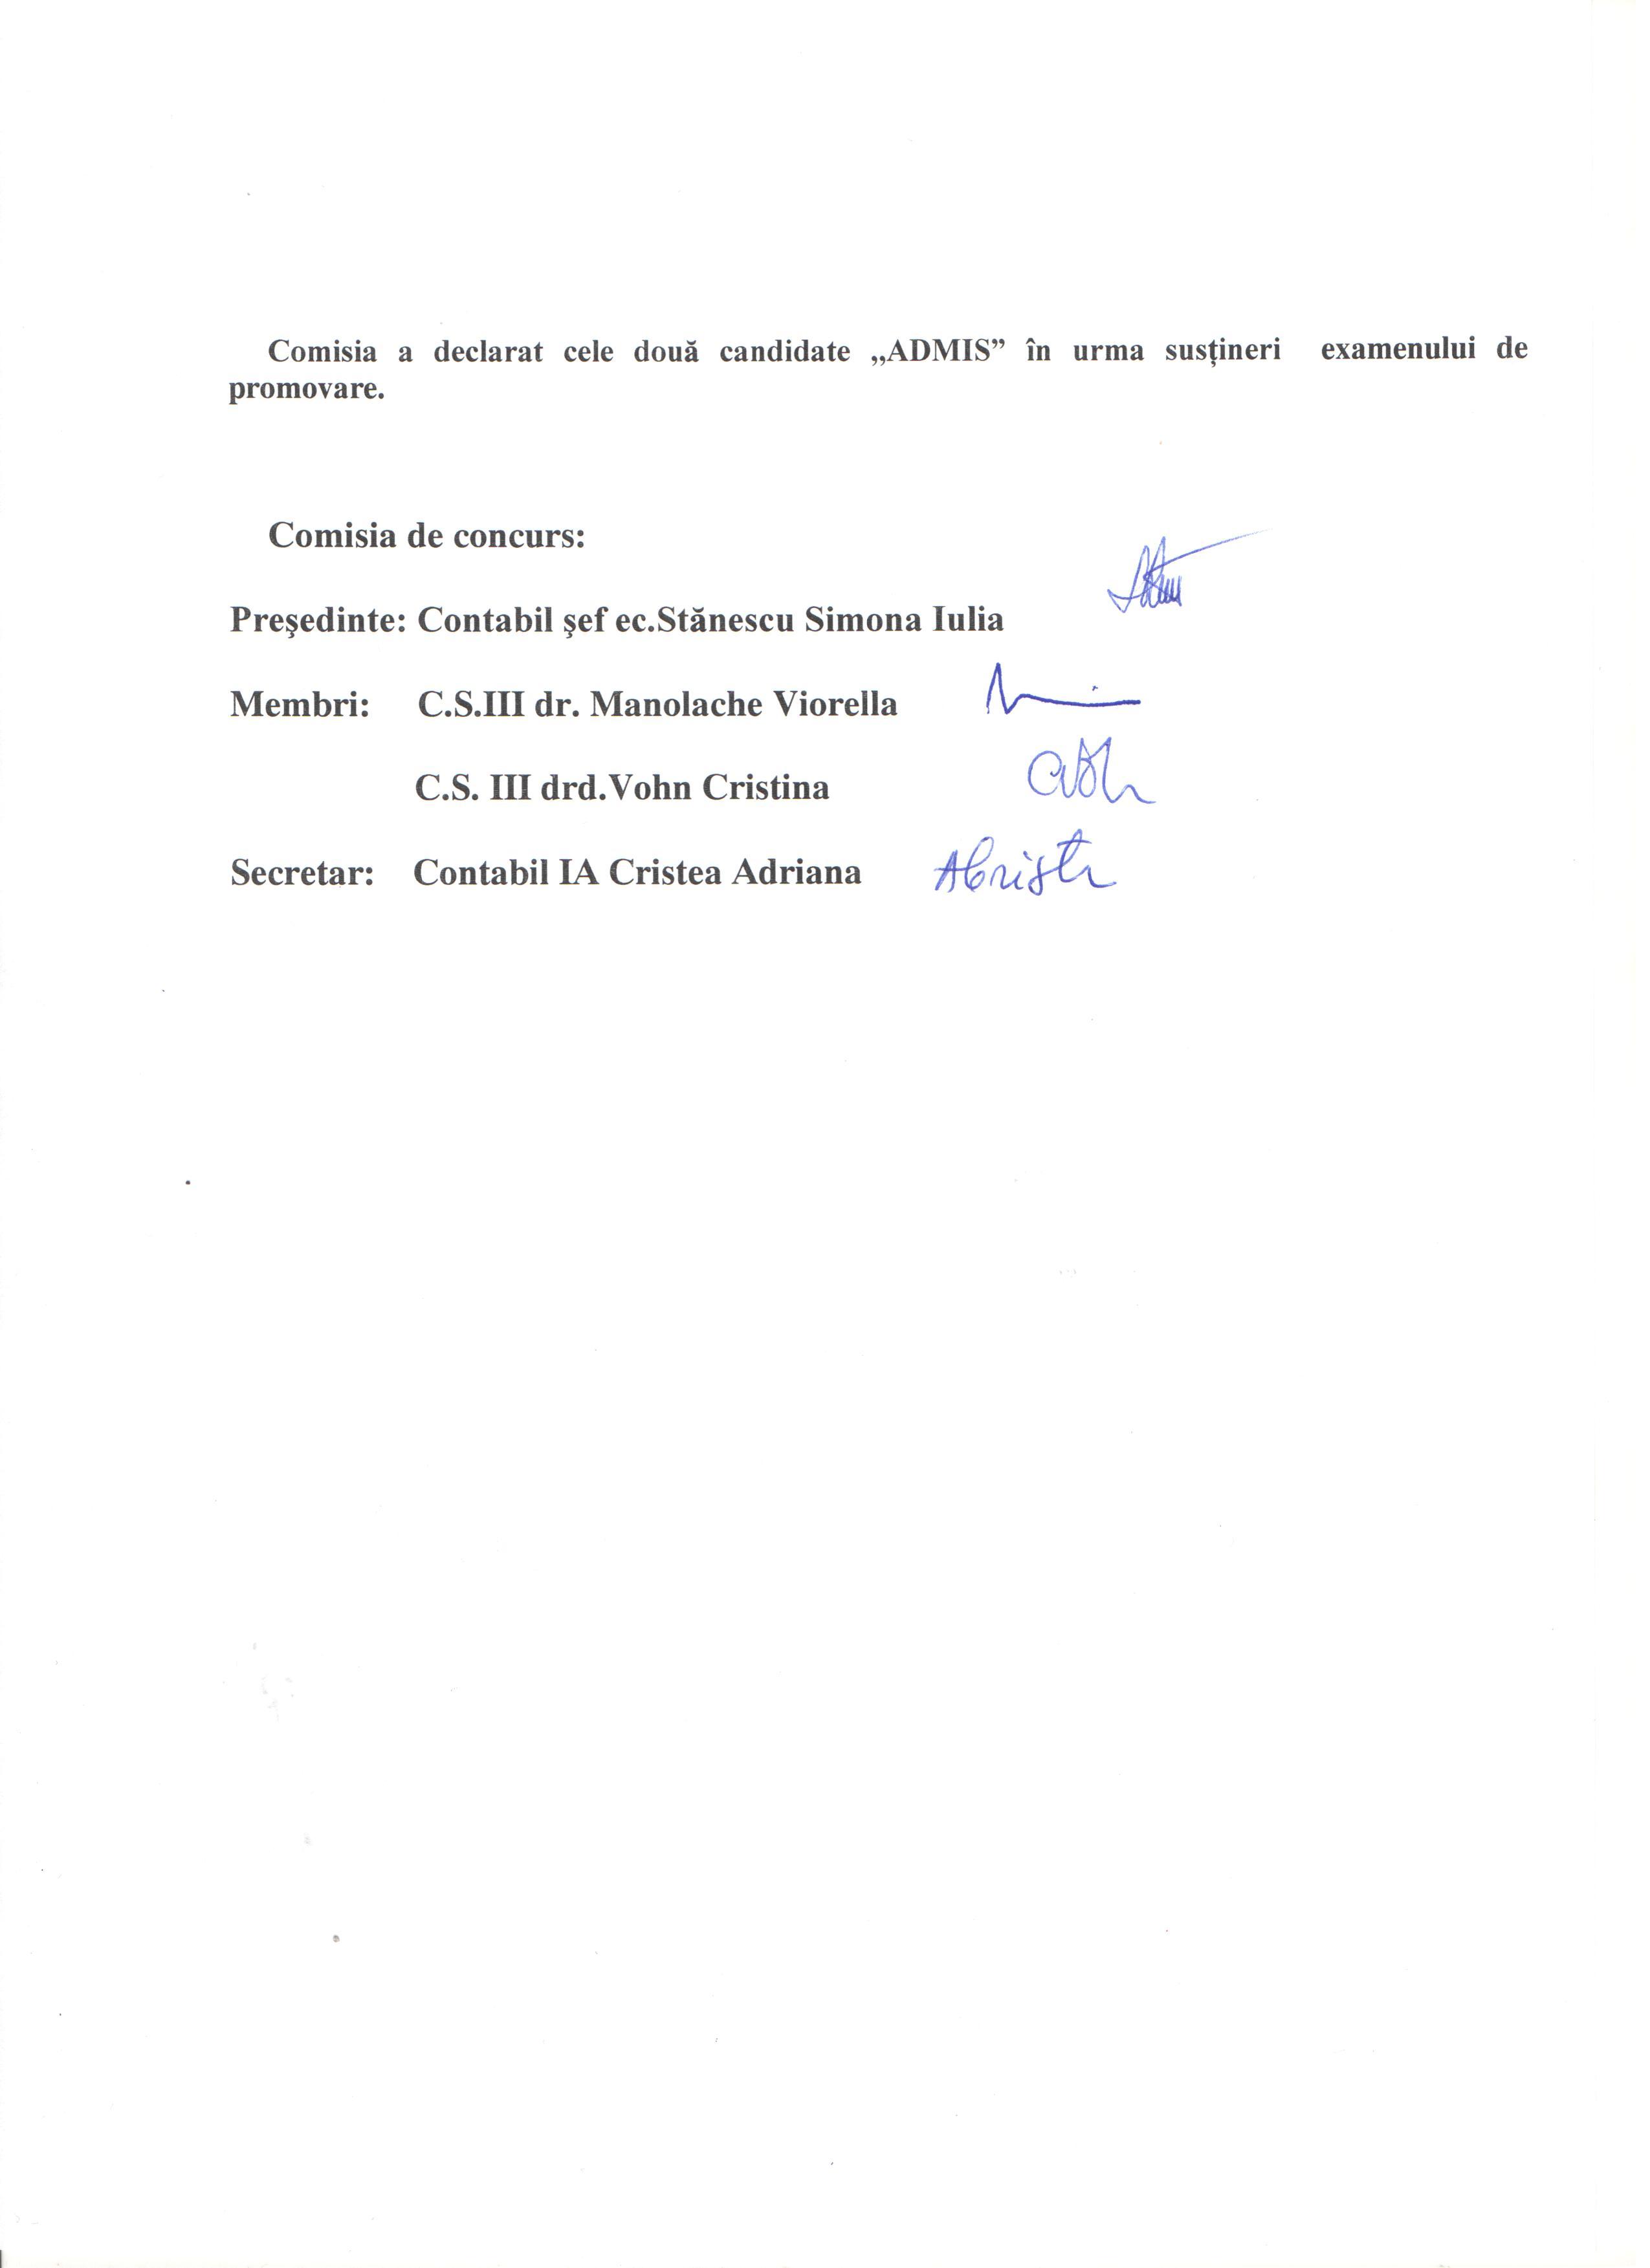 Rez.ex. de promovare pt. posturile analist progr.ajut.tr IA 001